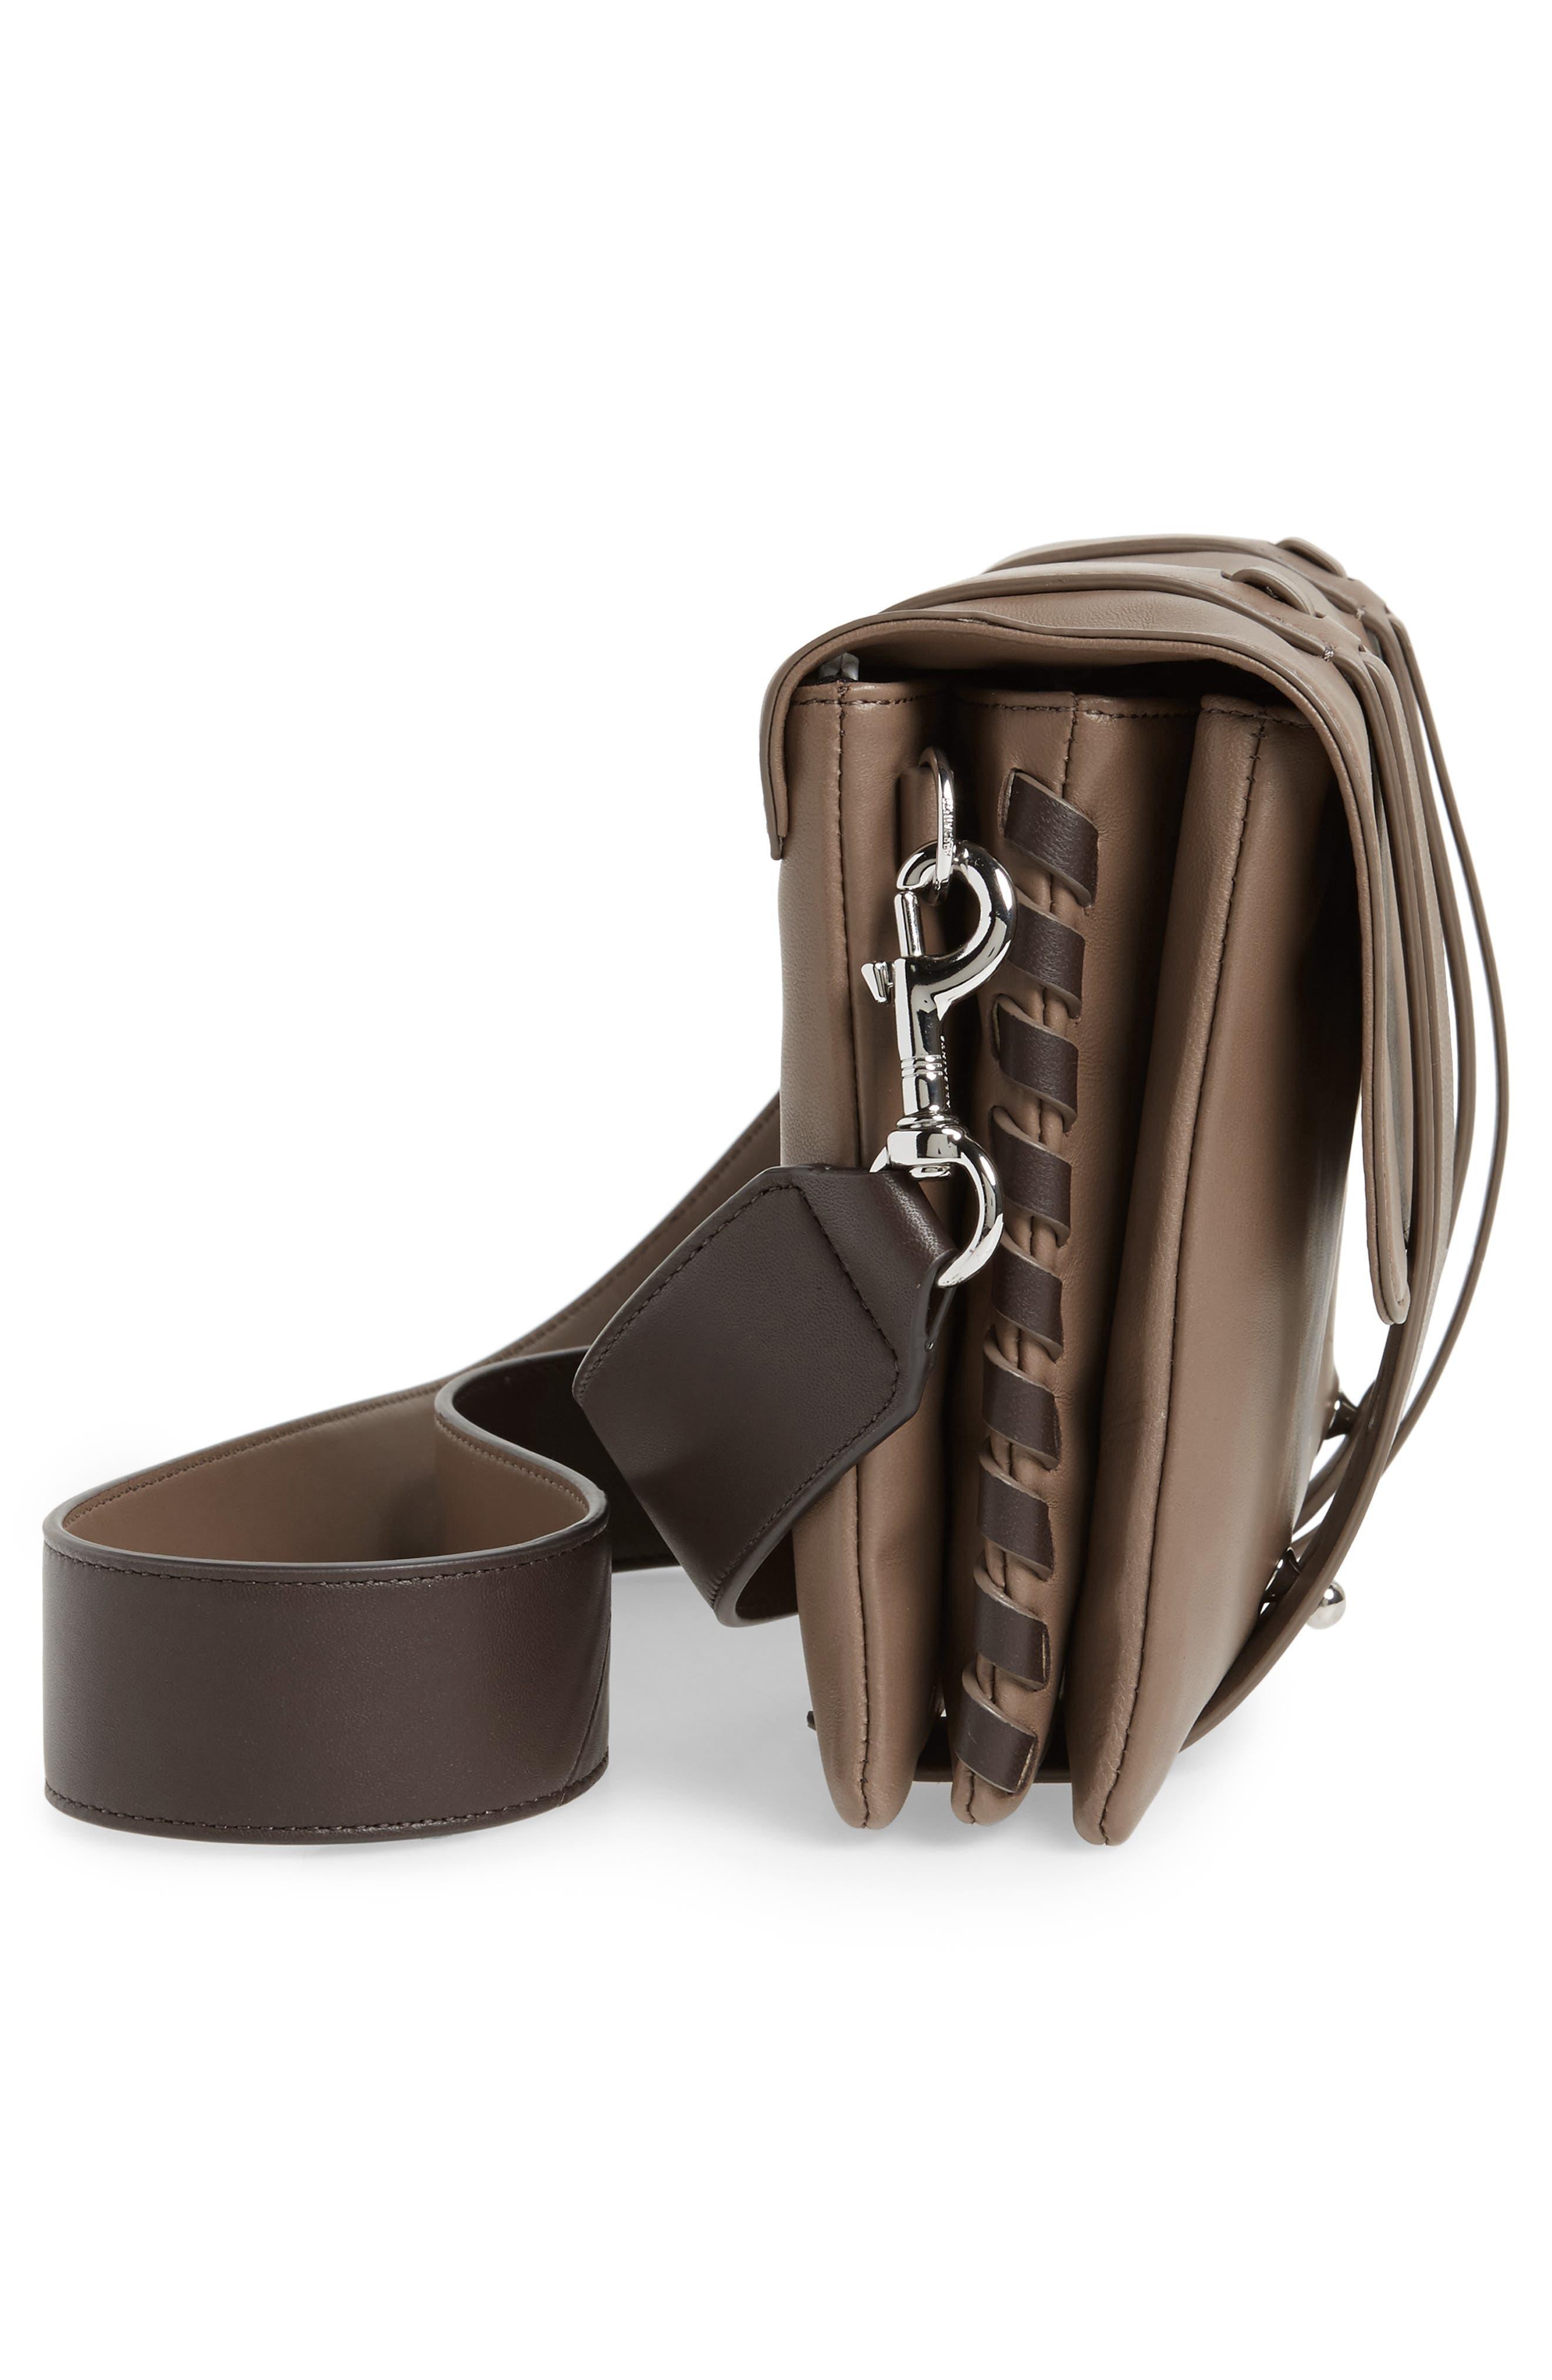 Fin Lambskin Leather Messenger Bag,                             Alternate thumbnail 9, color,